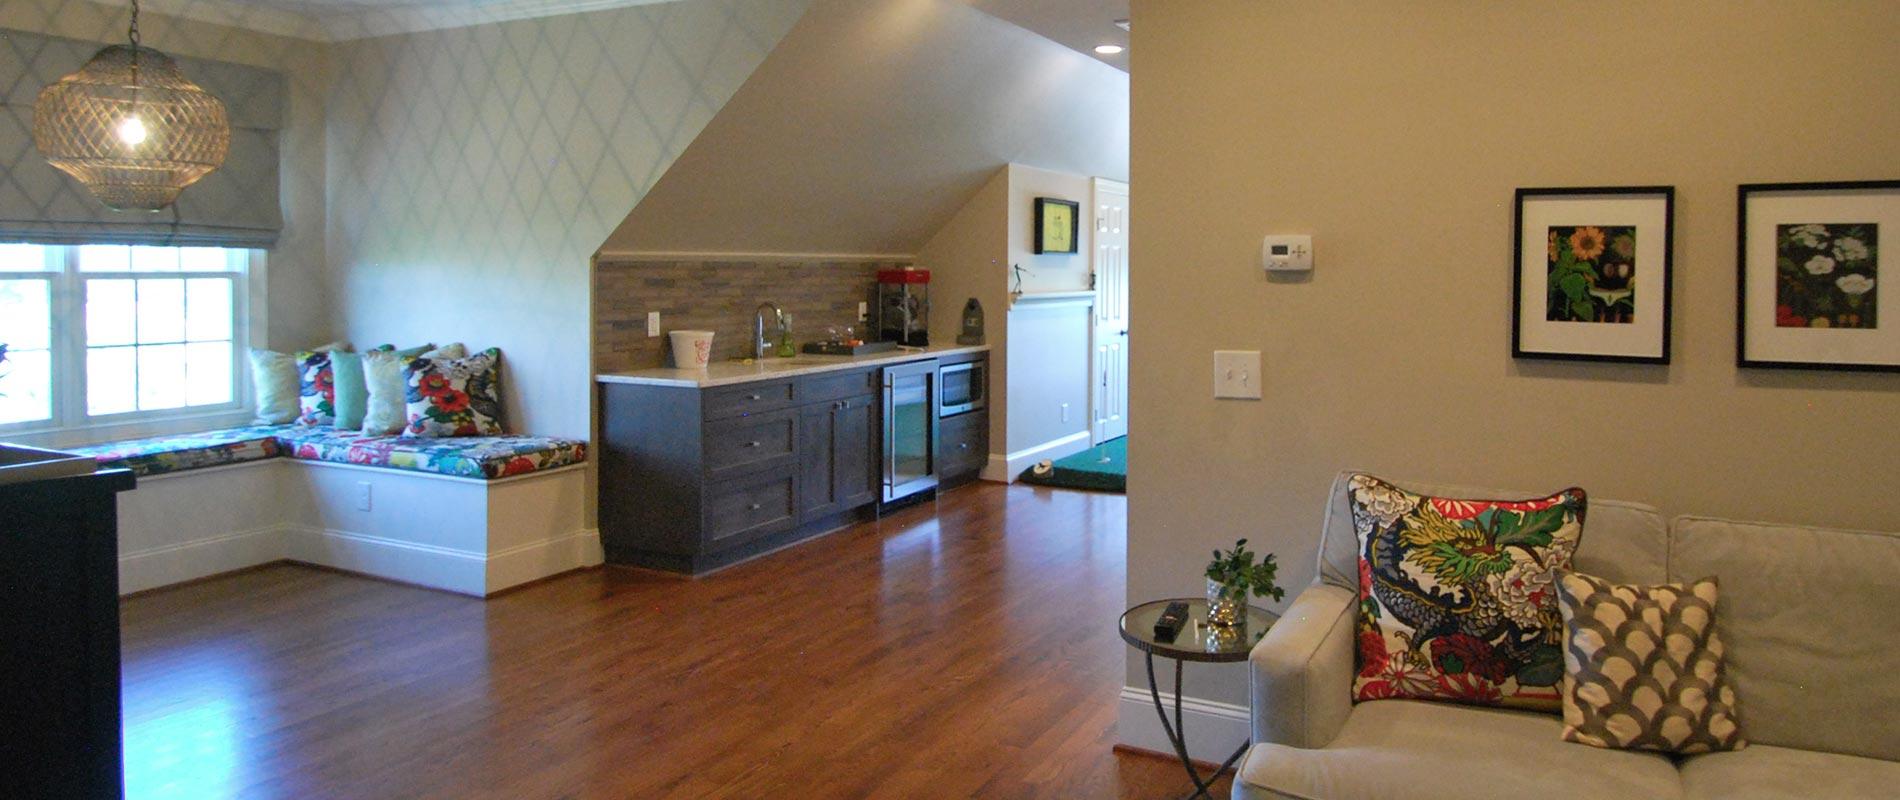 Living Room Renovation | Complete Construction Company | Apex, NC